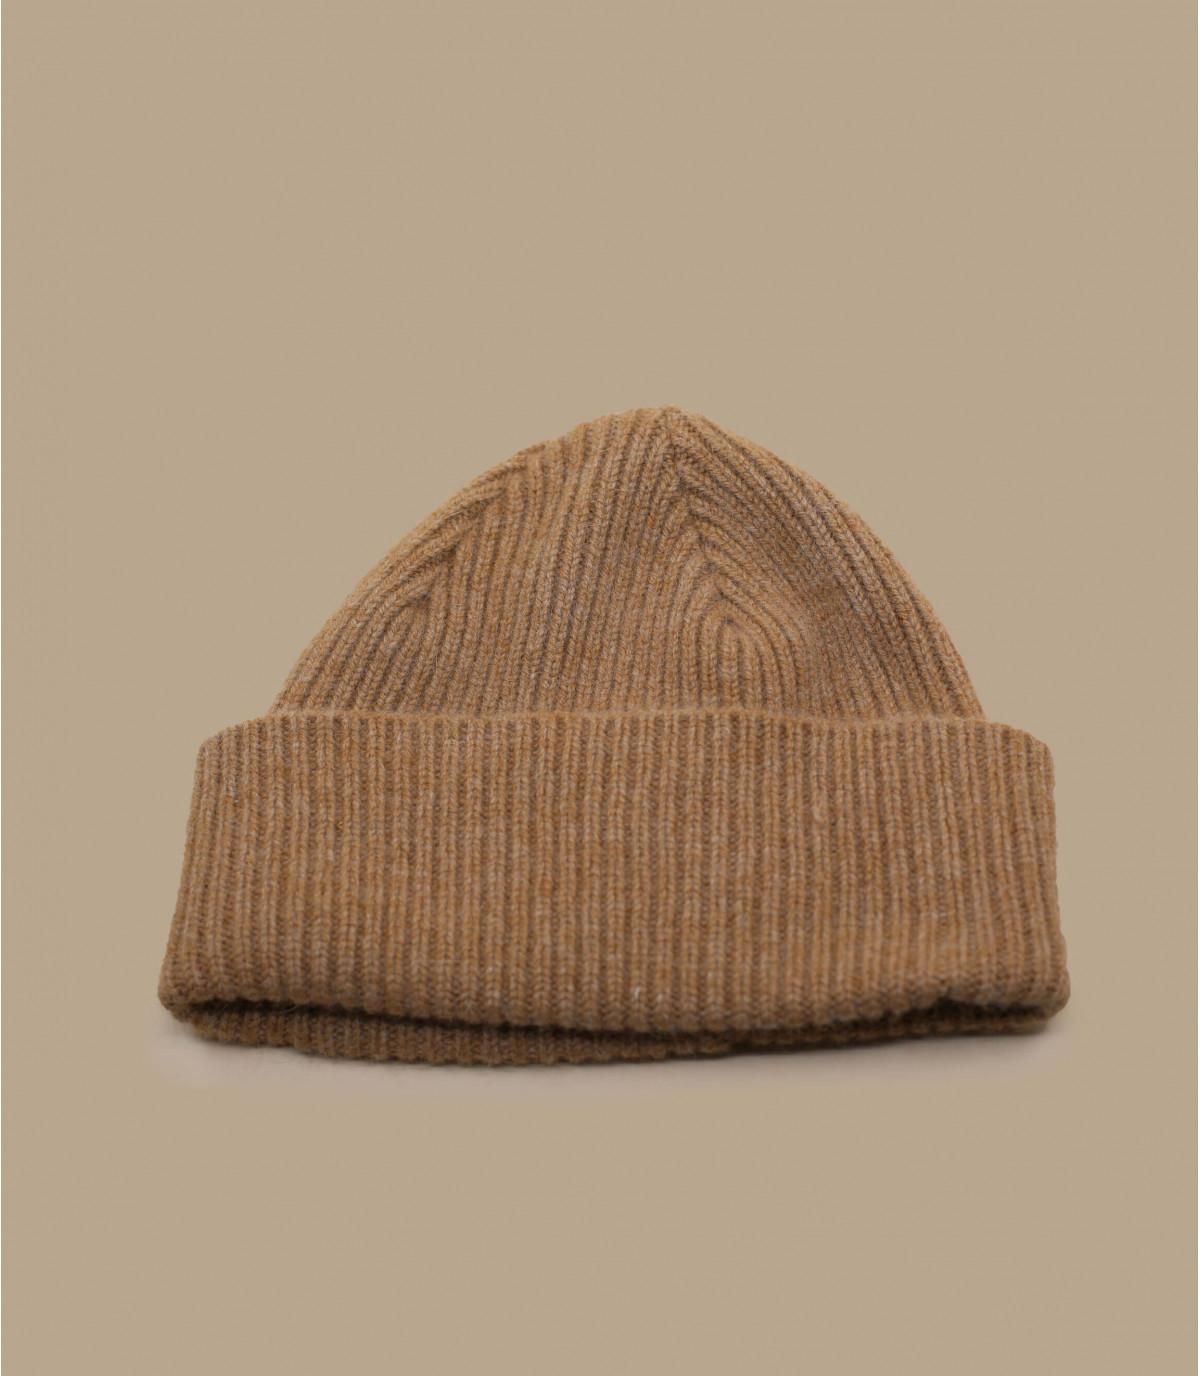 Beige Mütze Revers Wolle Angora